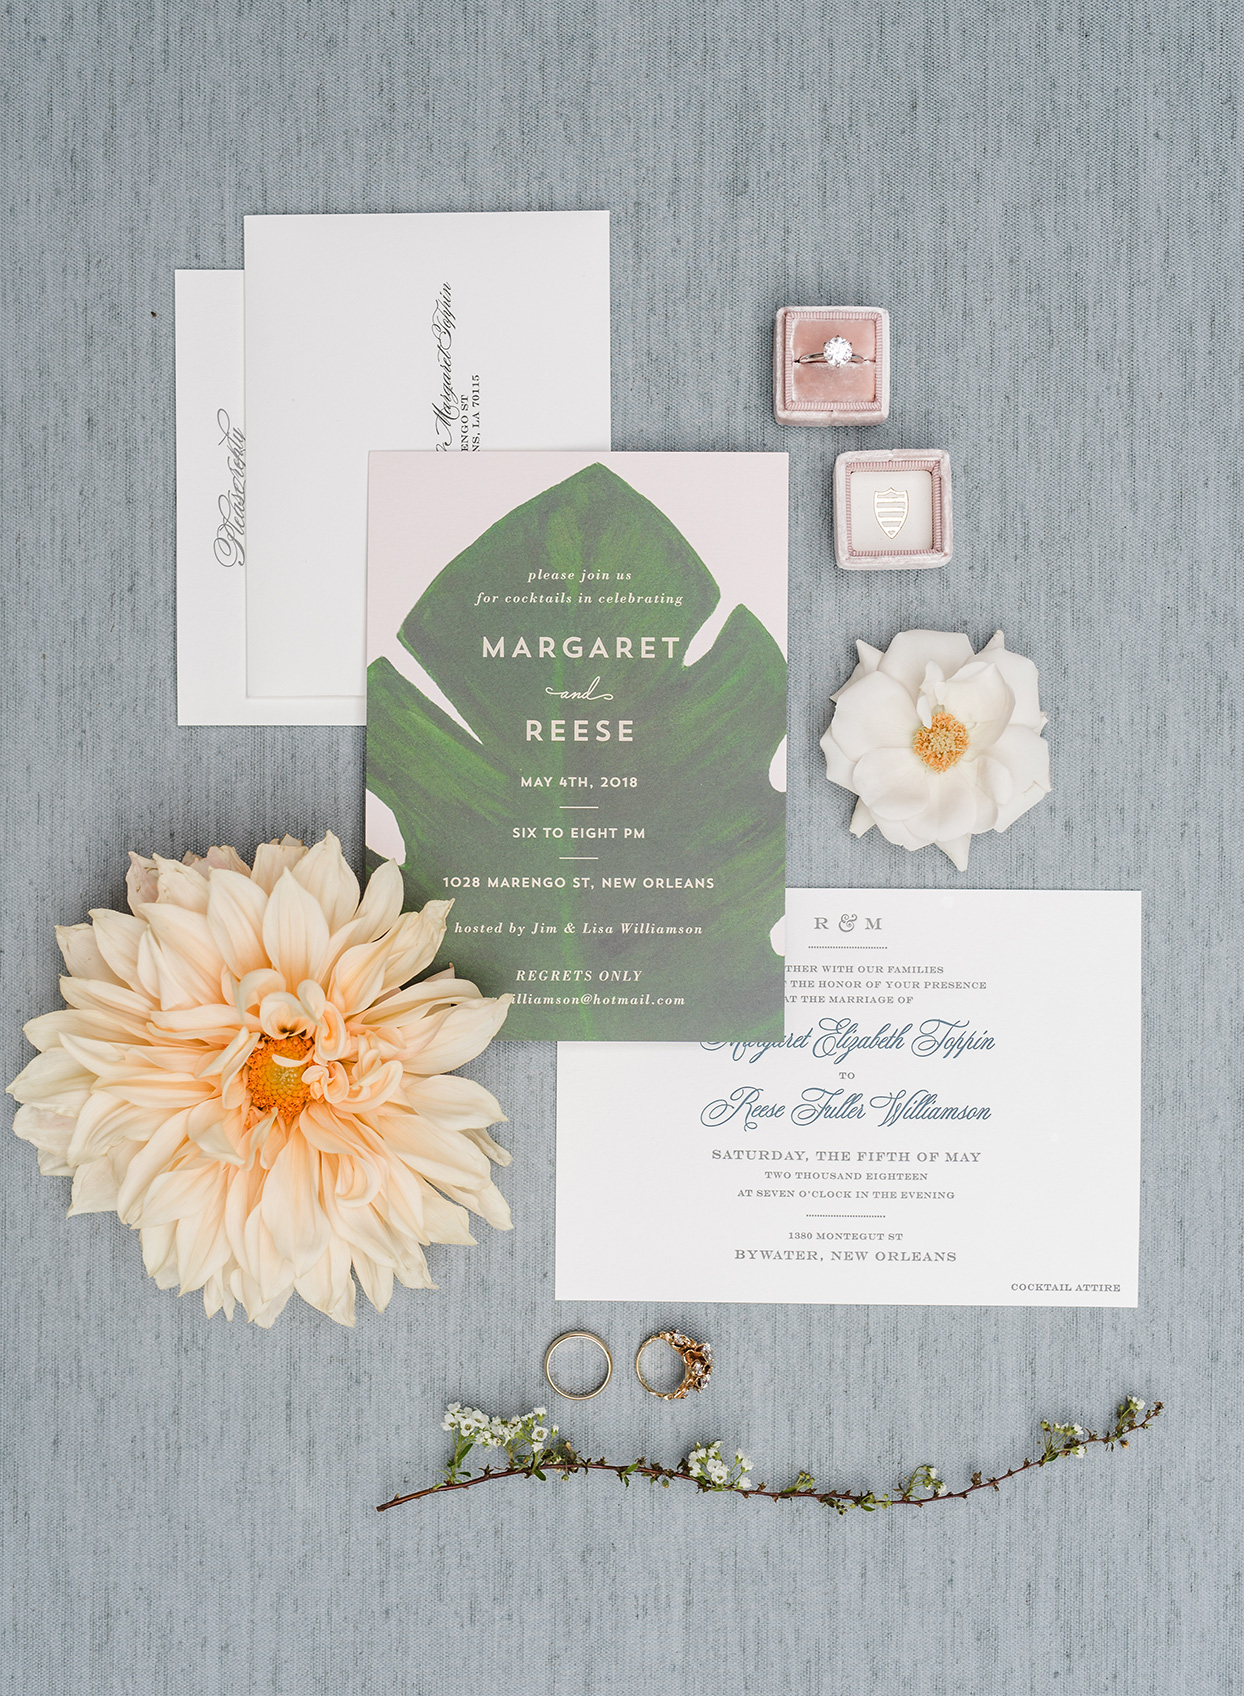 Wedding invitations with monstera leaf